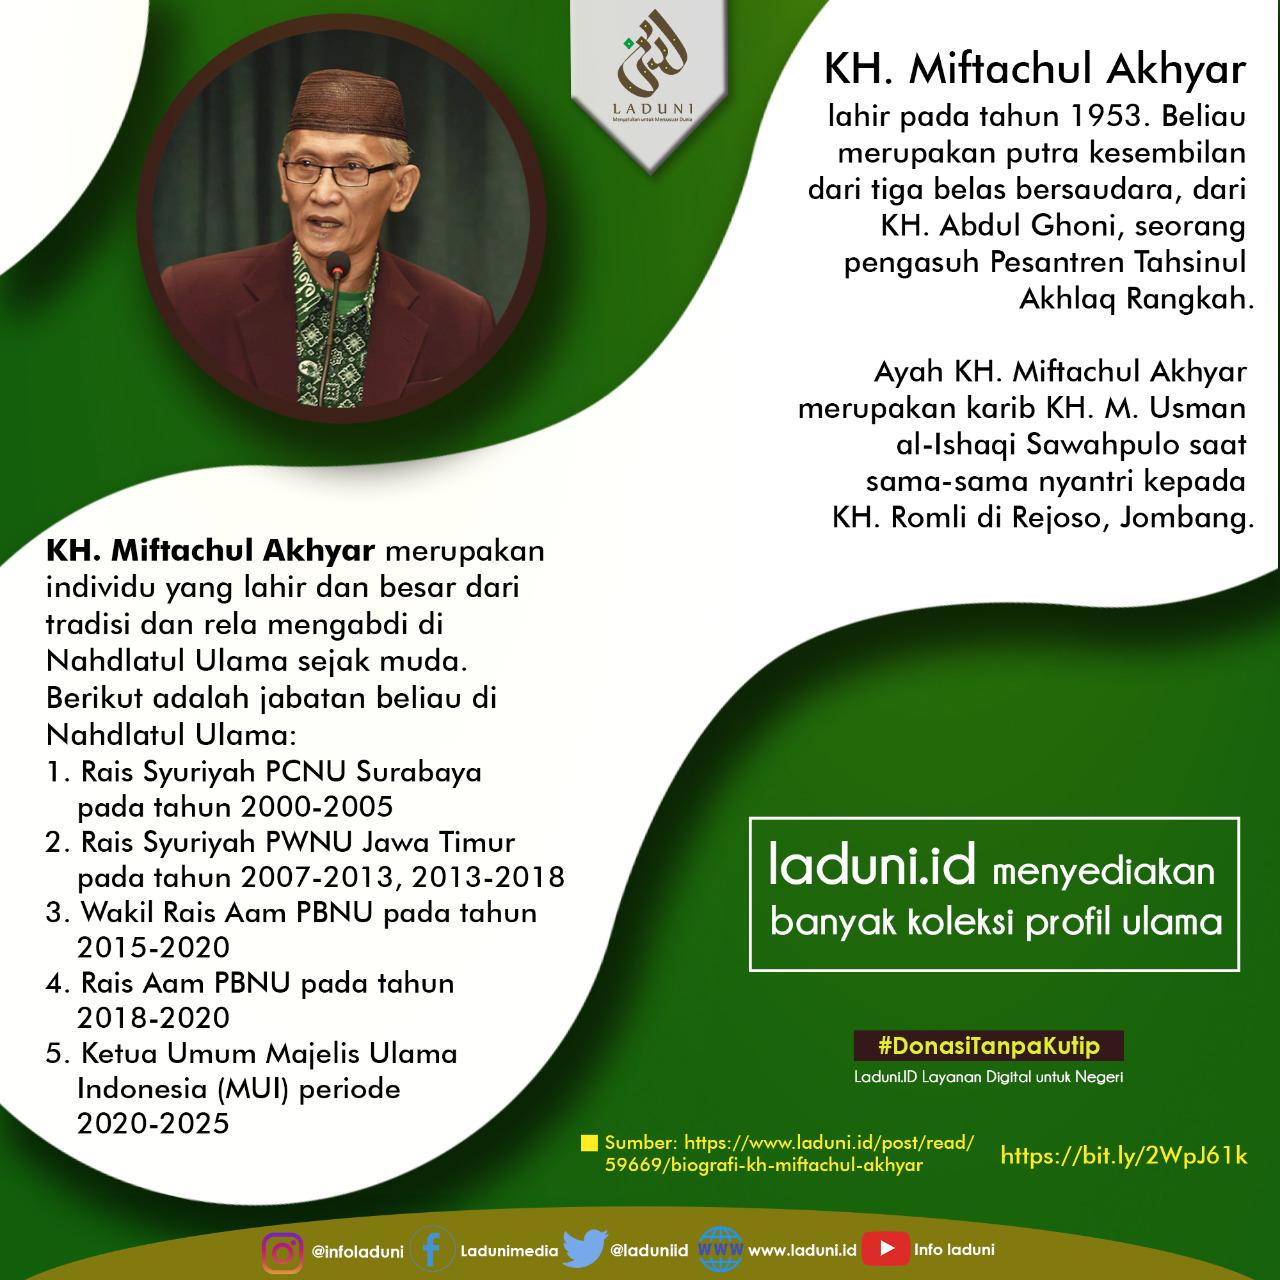 Biografi KH. Miftachul Akhyar